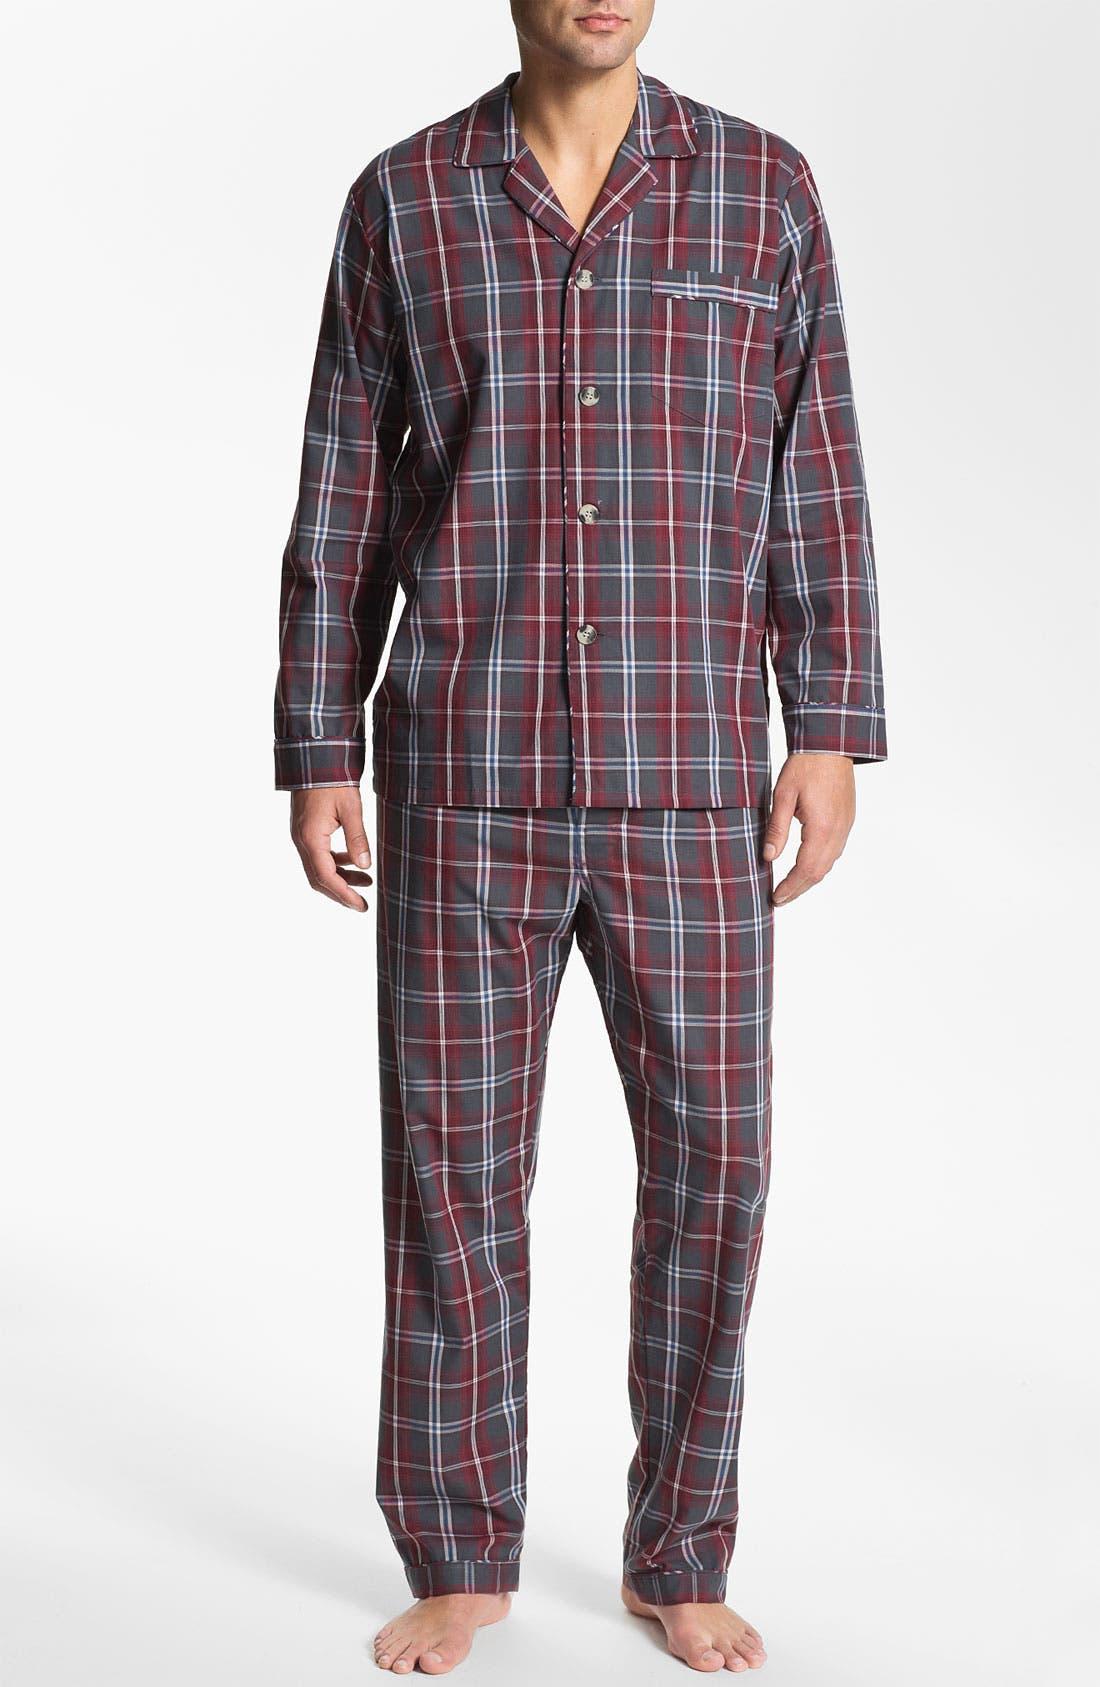 Main Image - Majestic Plaid Easy Care Pajama Set (Big & Tall)